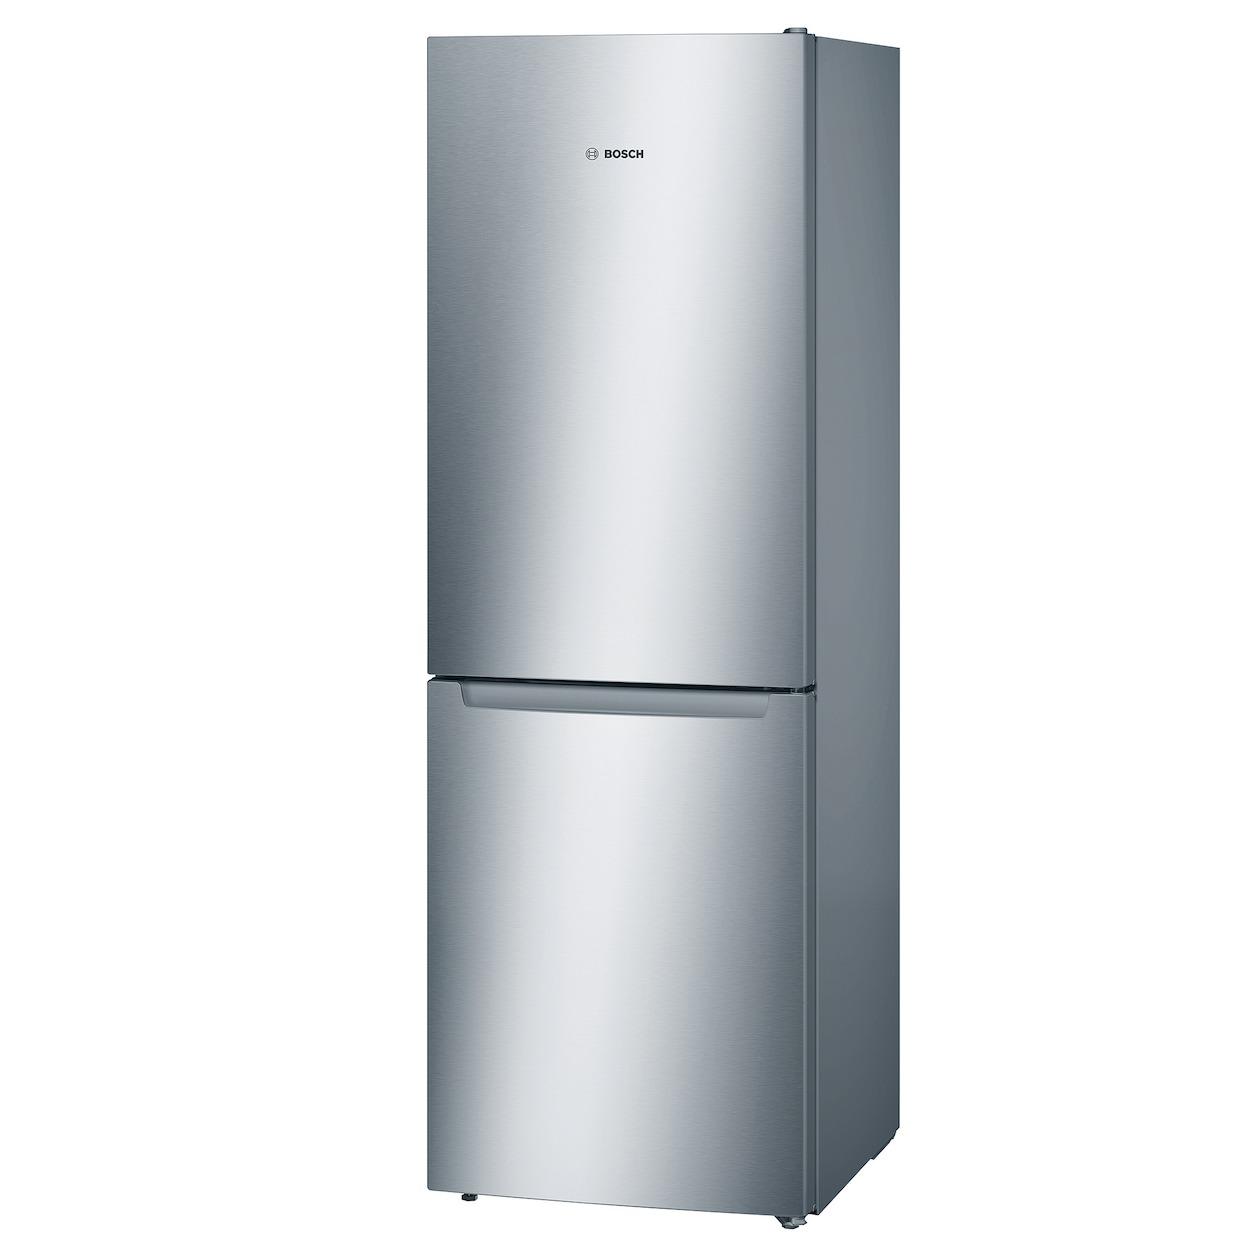 Bosch koelkast met vriesvak KGN33NL30